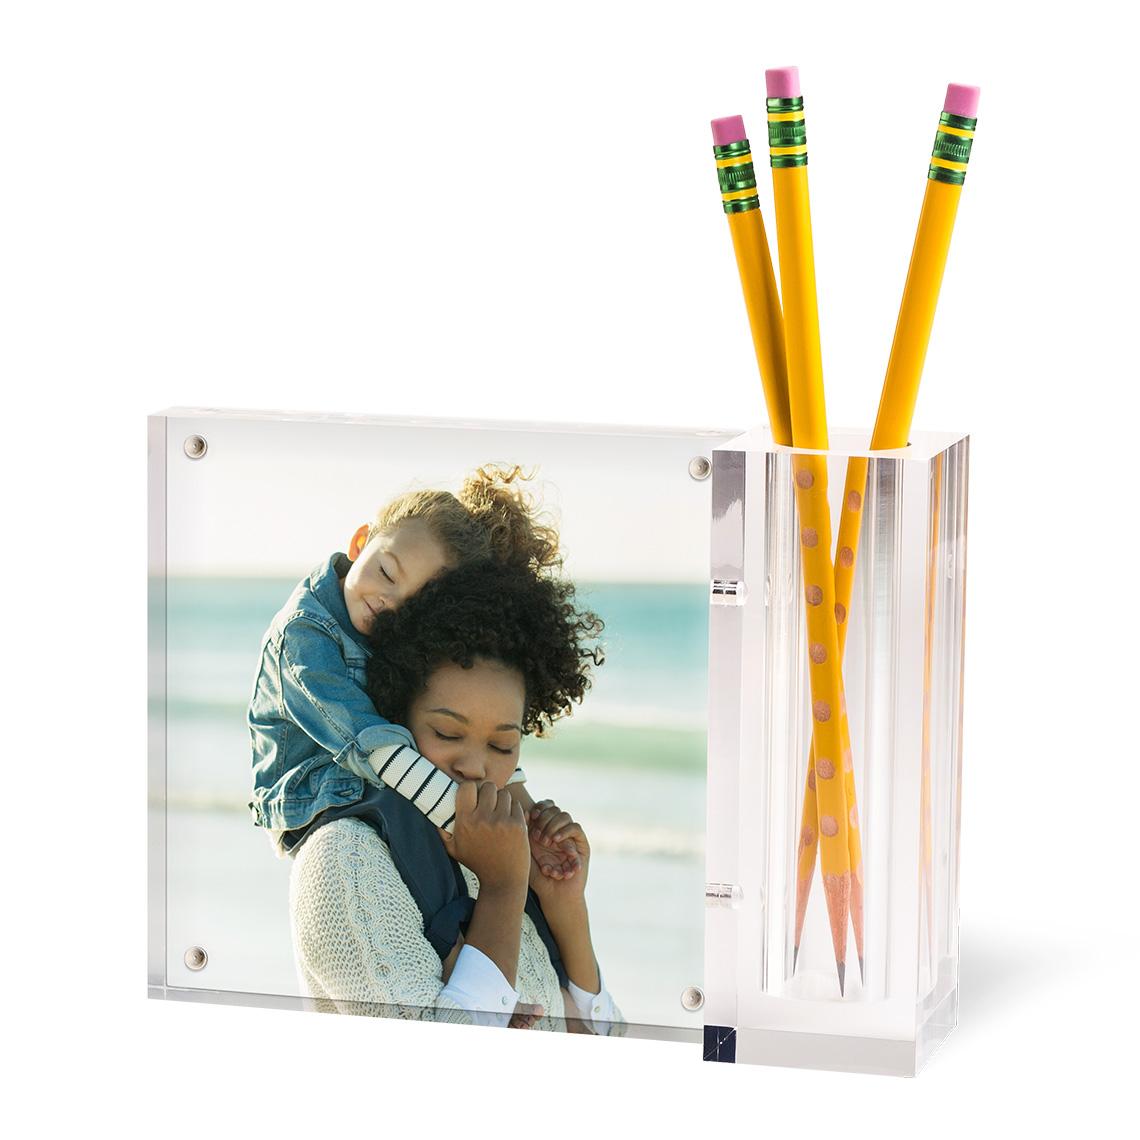 Online photo printing photo cards photo books photo canvases acrylic photo desk set 1betcityfo Images